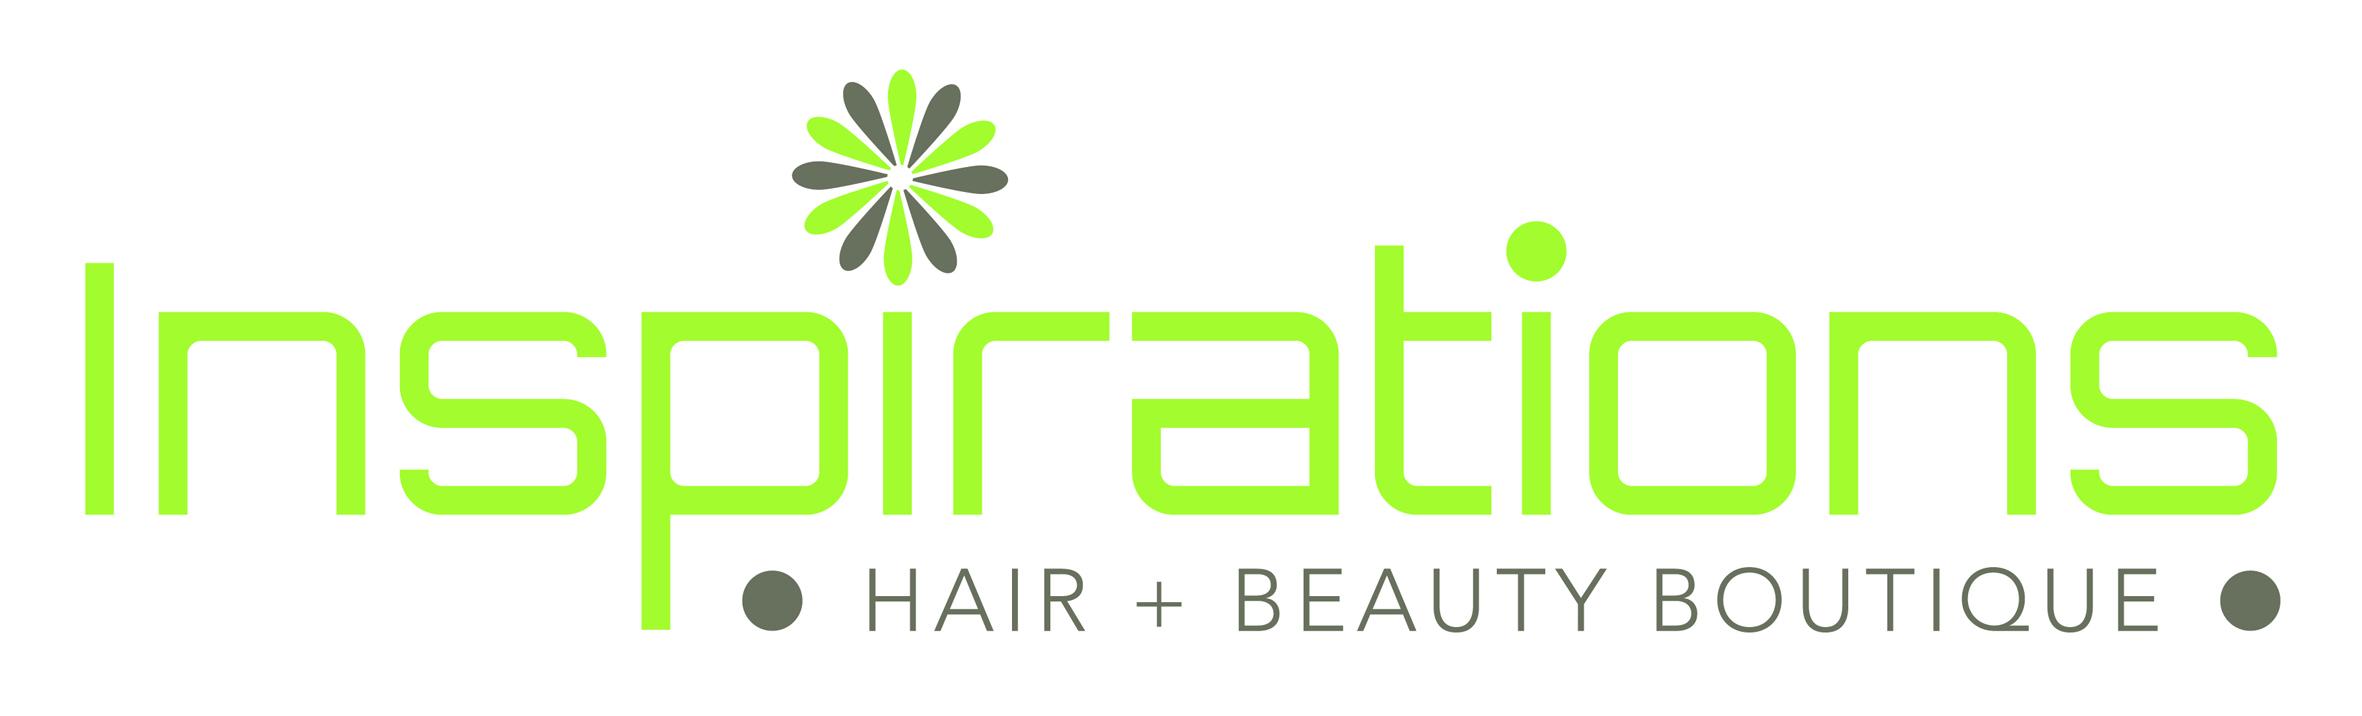 Inspirations Boutique Hair Beauty Boutique Felpham Logo